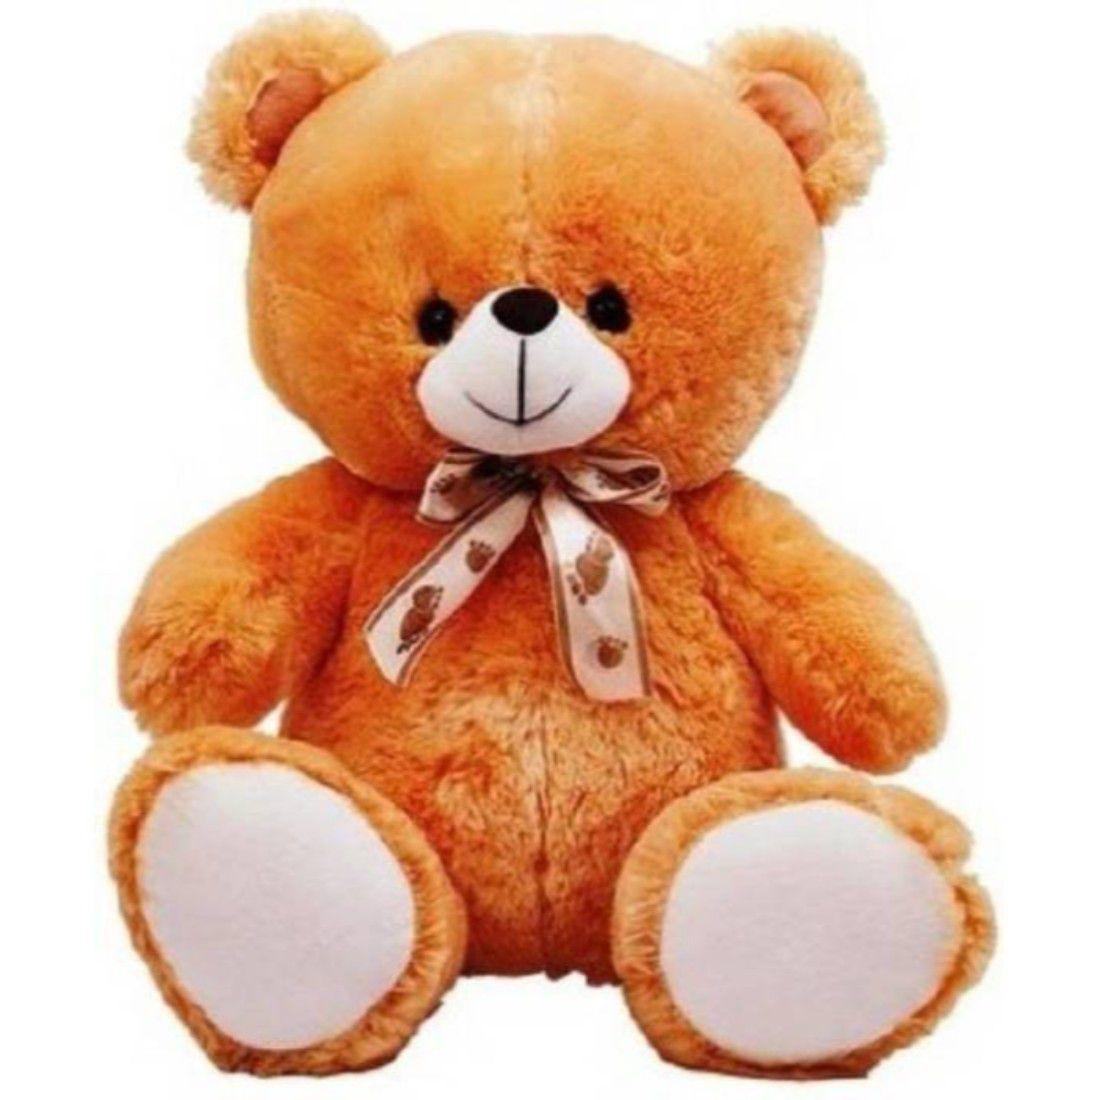 Dino impex 3 Feet Brown Taddy Huggable Cute Teddy Bear For Girls  amp; Boys